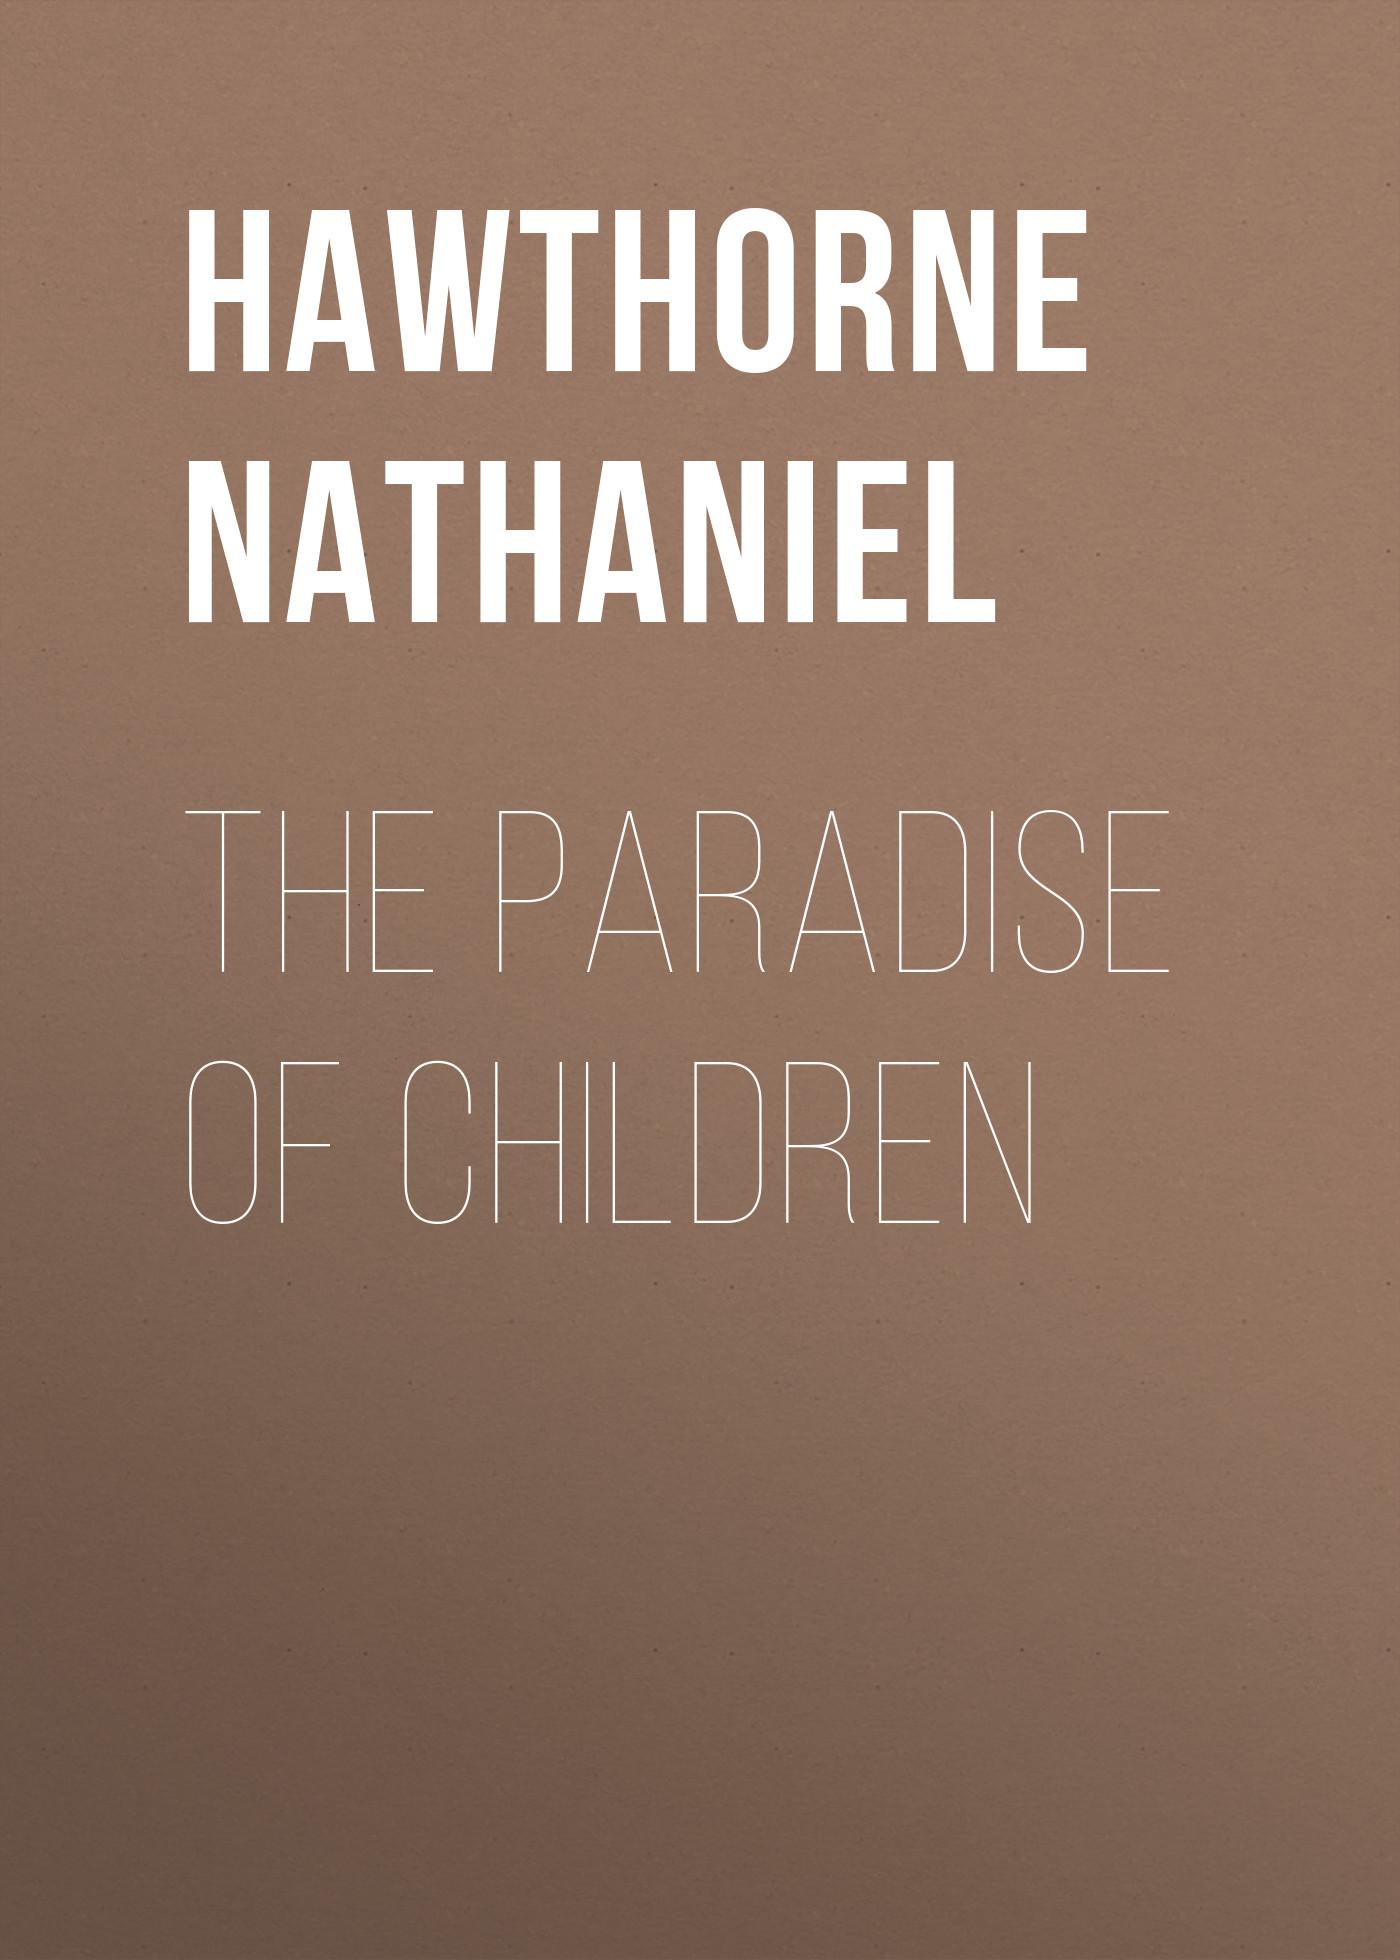 Hawthorne Nathaniel The Paradise of Children hawthorne nathaniel love letters of nathaniel hawthorne volume 1 of 2